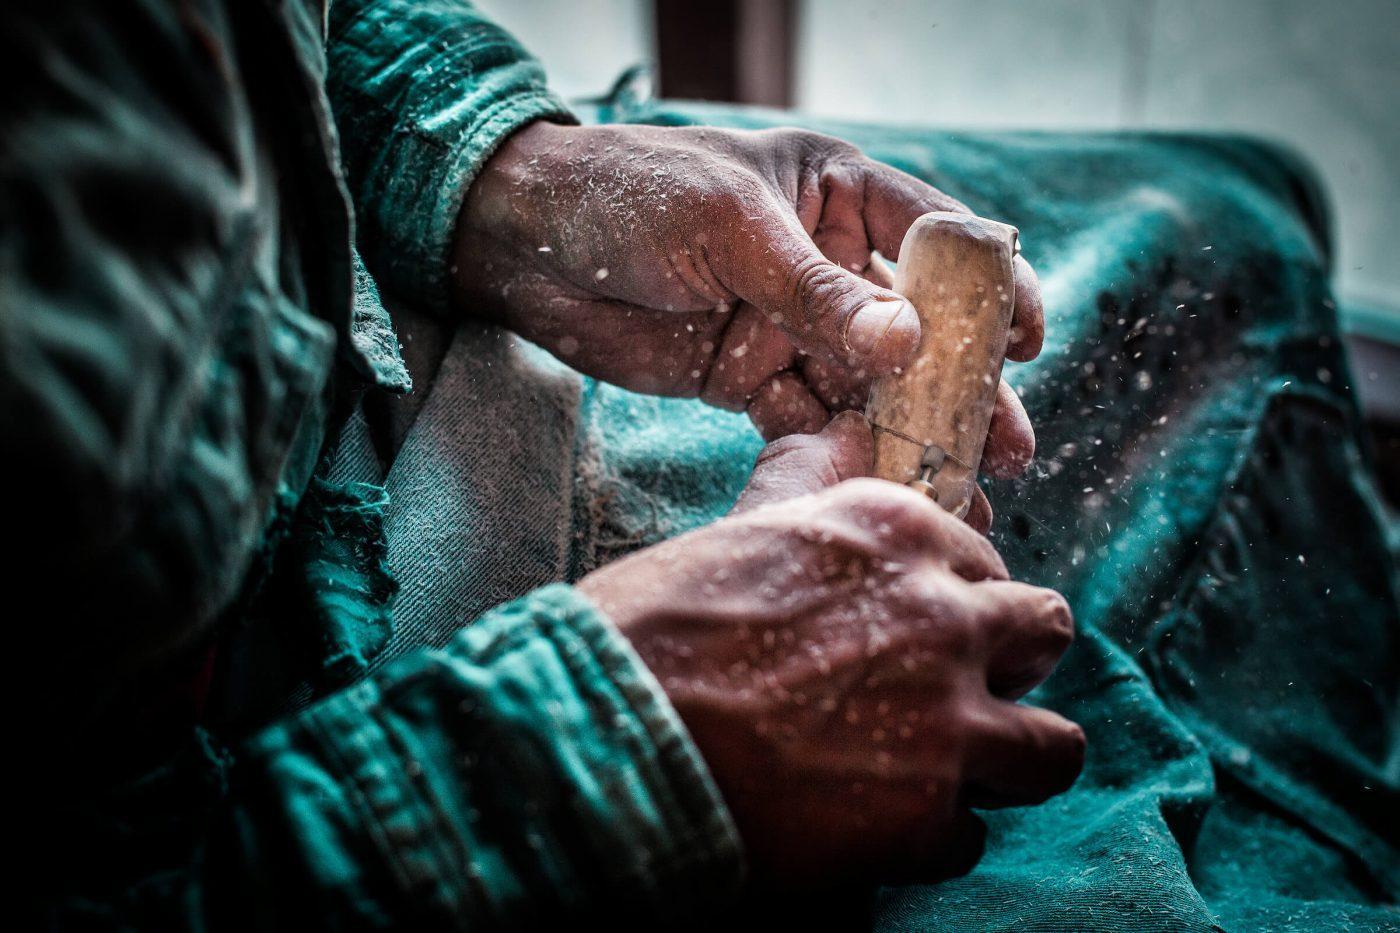 Enok Kilime carving reindeer bone in Sisimiut in Greenland - by Mads Pihl